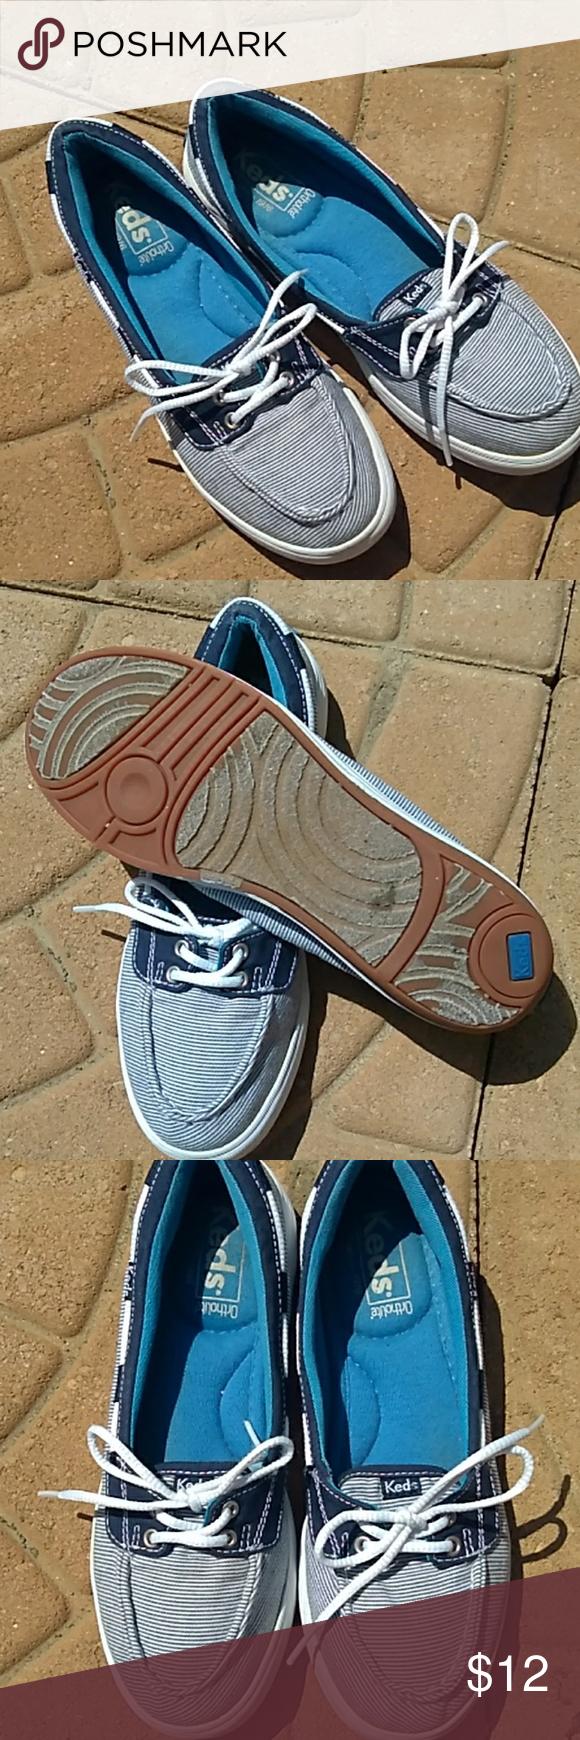 KEDS Ortholite boat shoes. in 2020